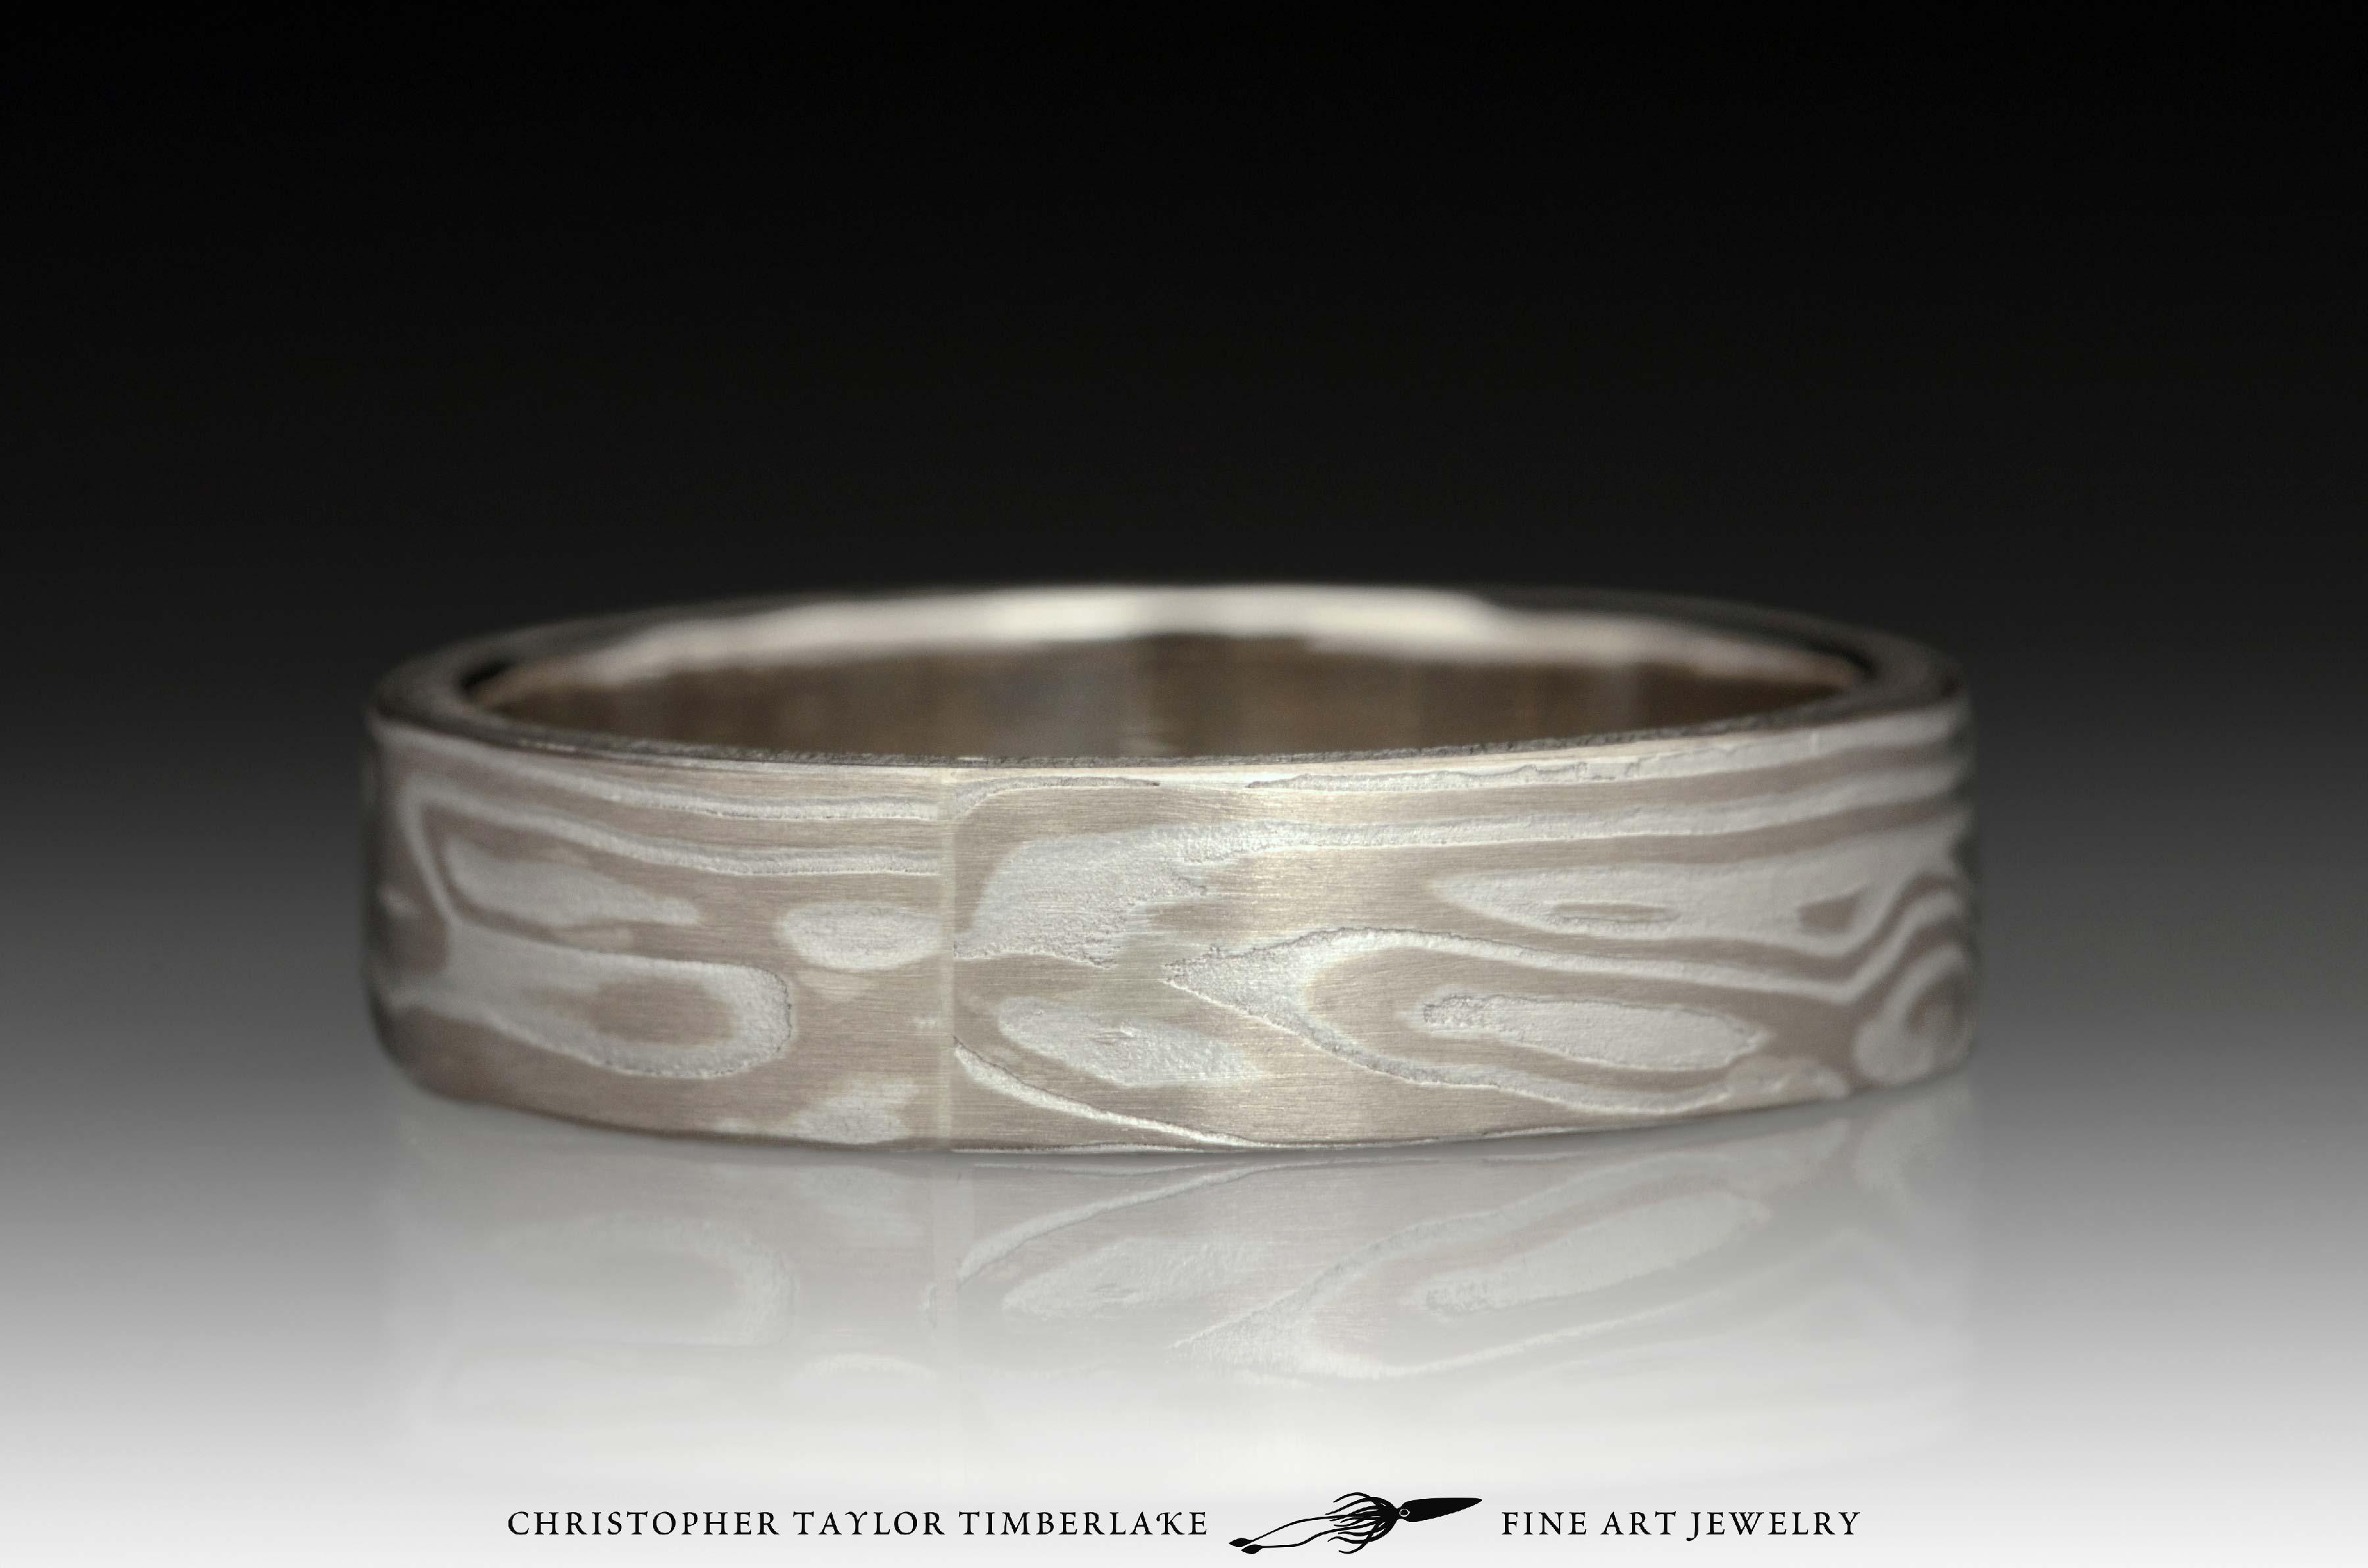 Mokumé-Mokume-Gane-Ring-(M92)-14K-karat-palladium-white-gold,-sterling-silver,-14k-white-gold-inner-band,-etched,-flat-topped,-wood-grain-3